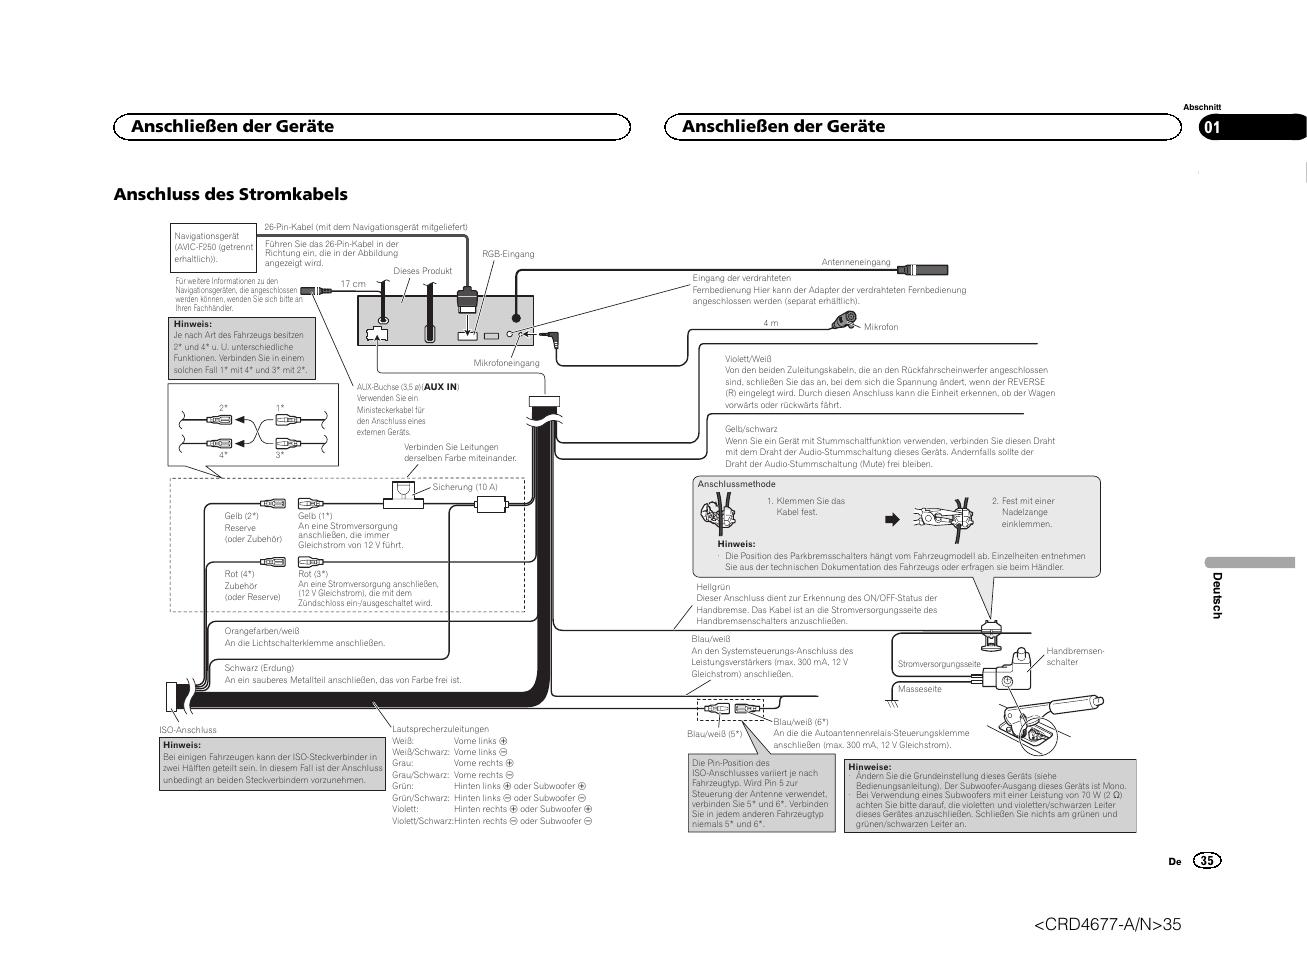 Anschluss Des Stromkabels Anschlie En Der Gerate